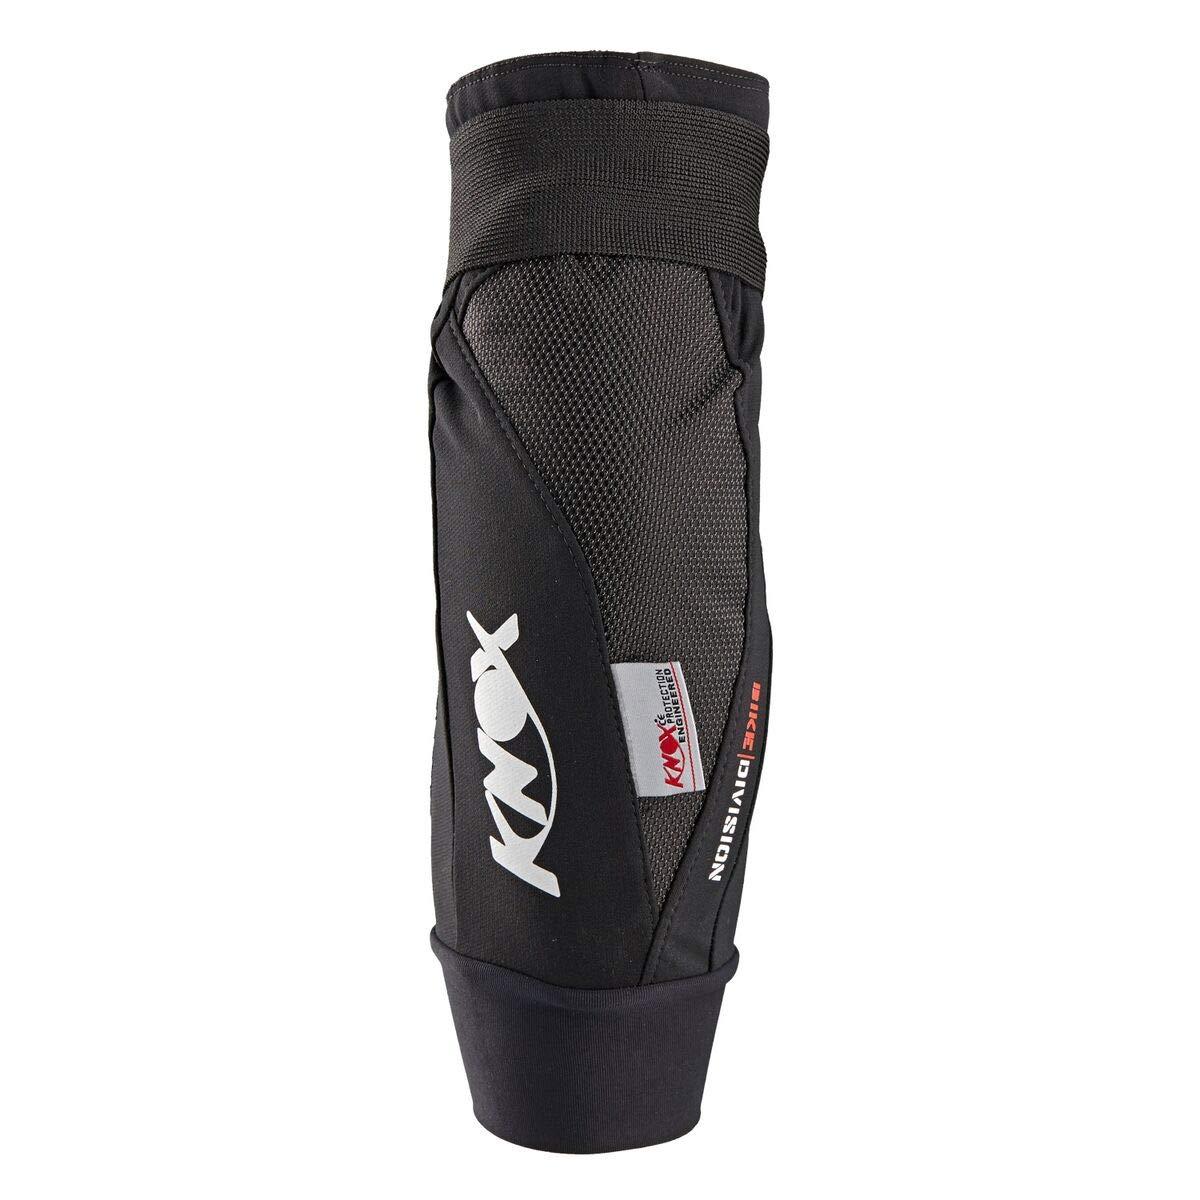 S Knox Defender Elbow Armour